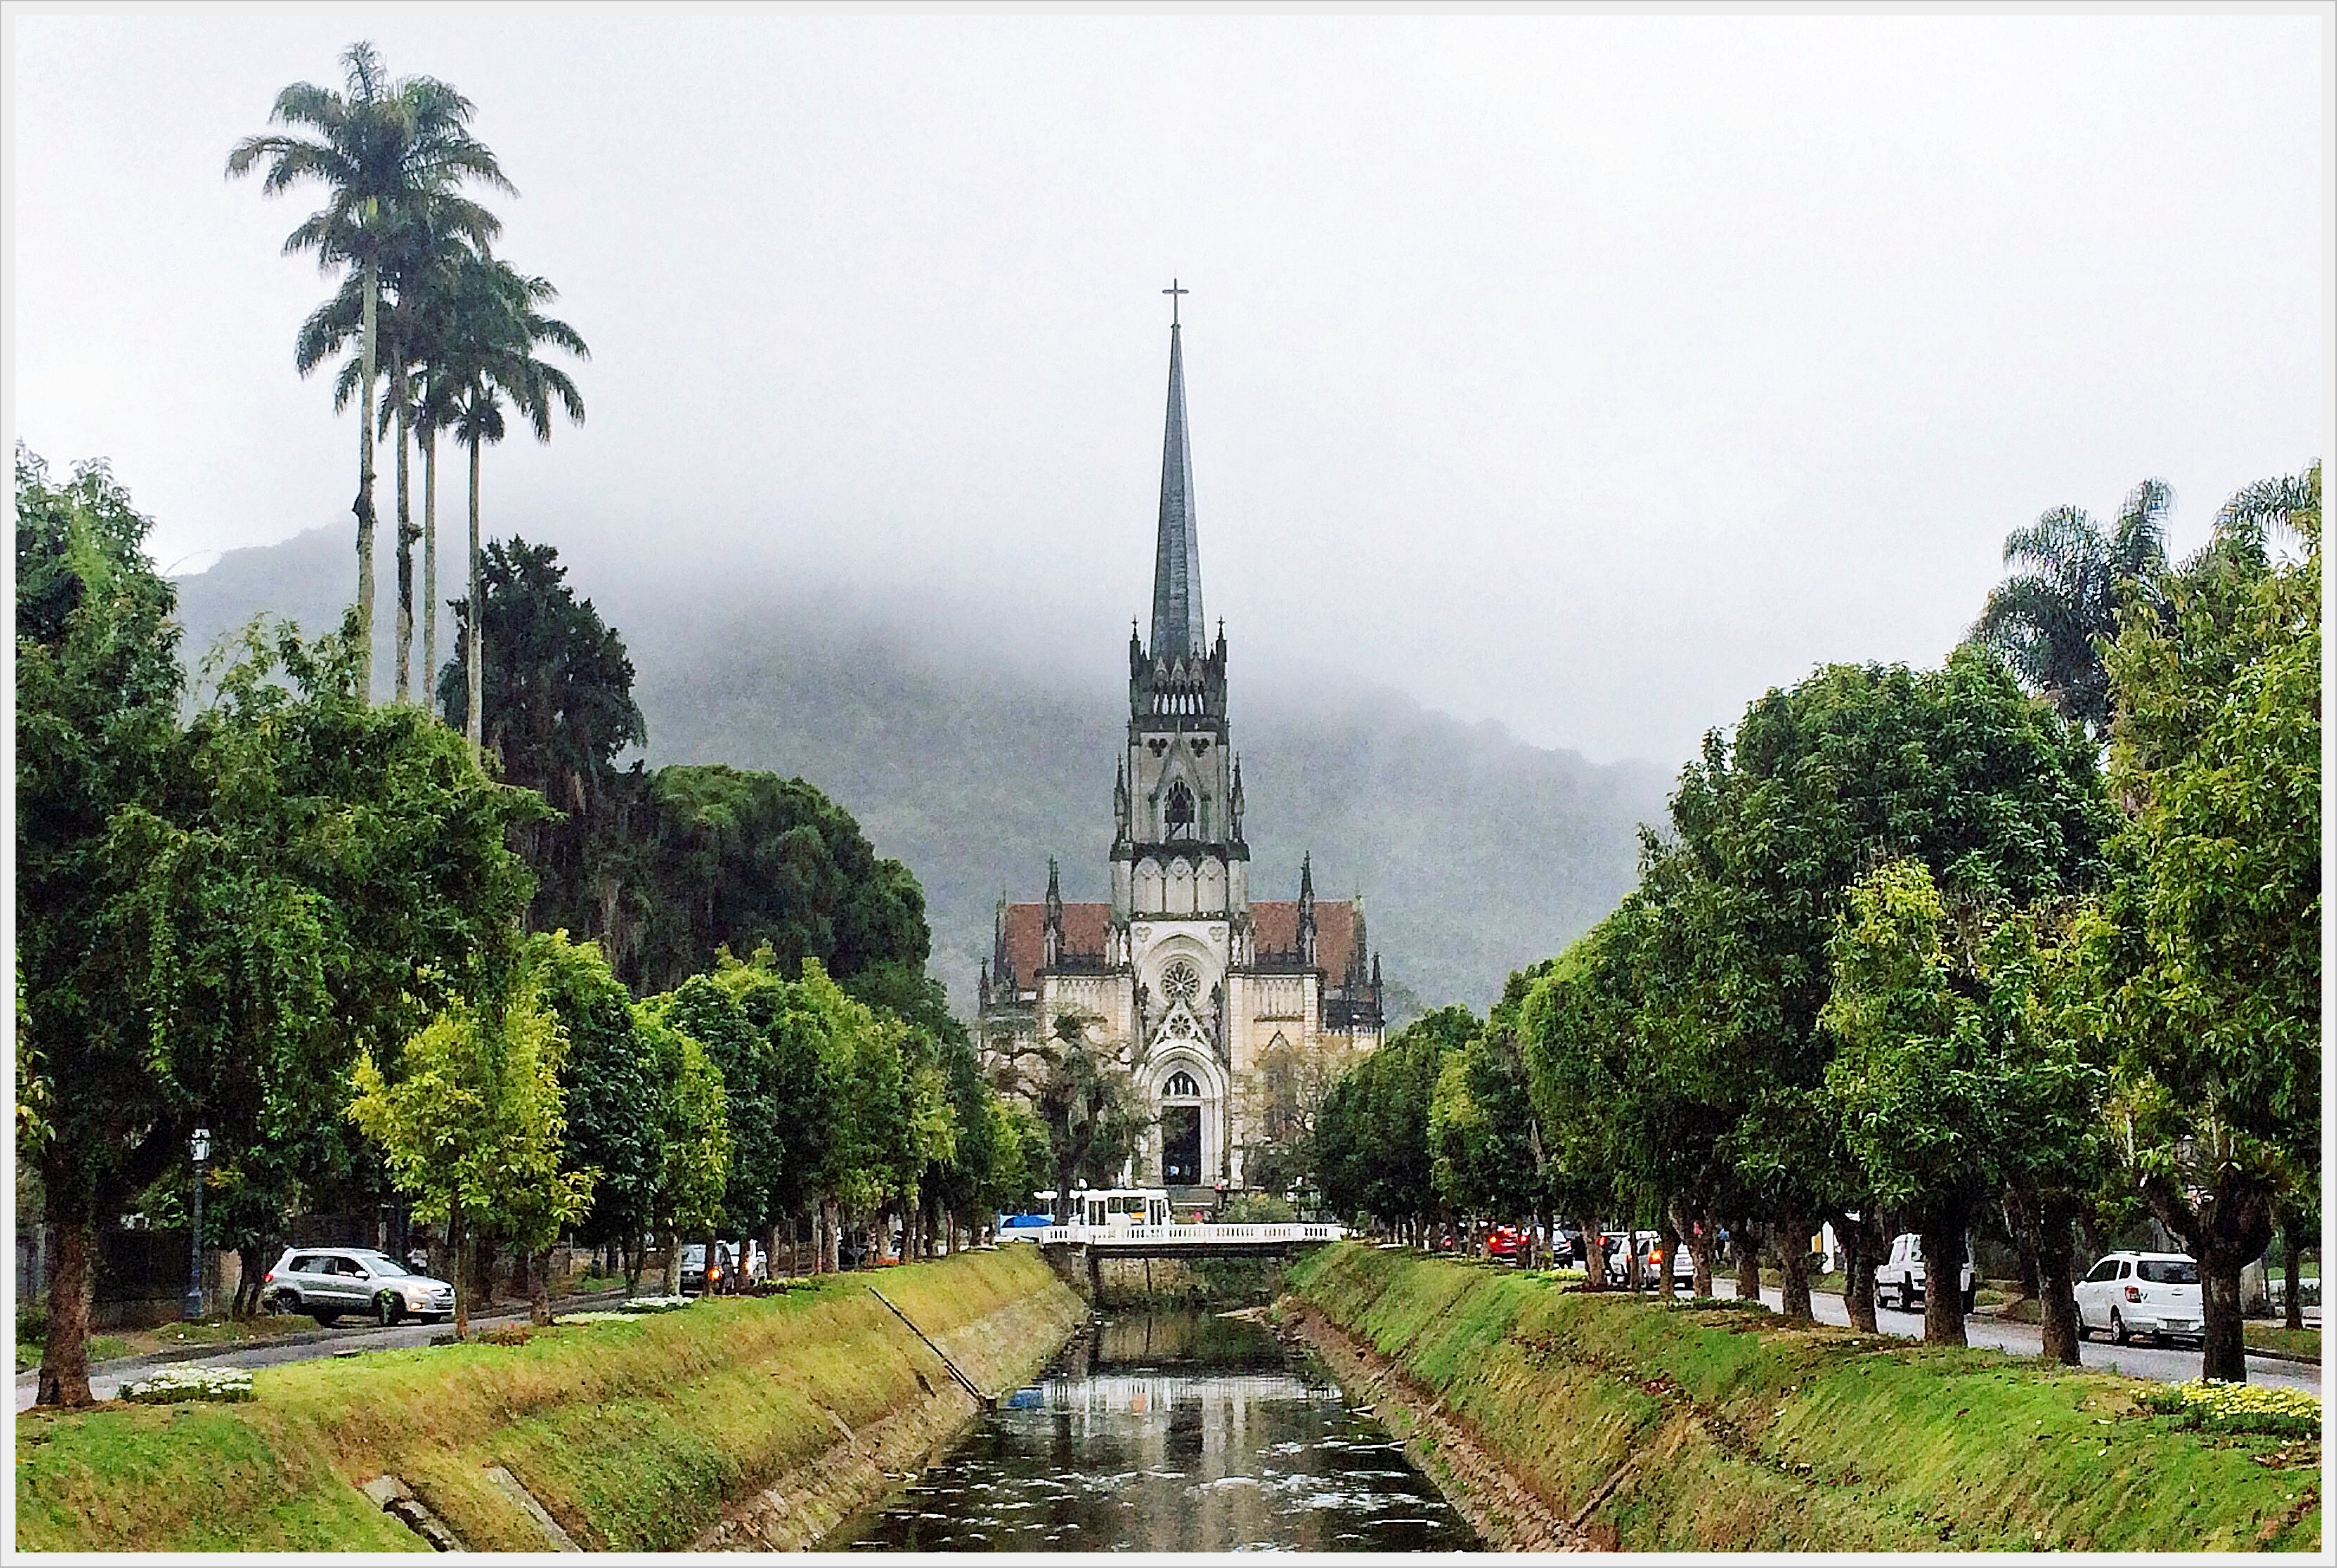 2016 Rio de Janeiro (Petropolis Cathedral)